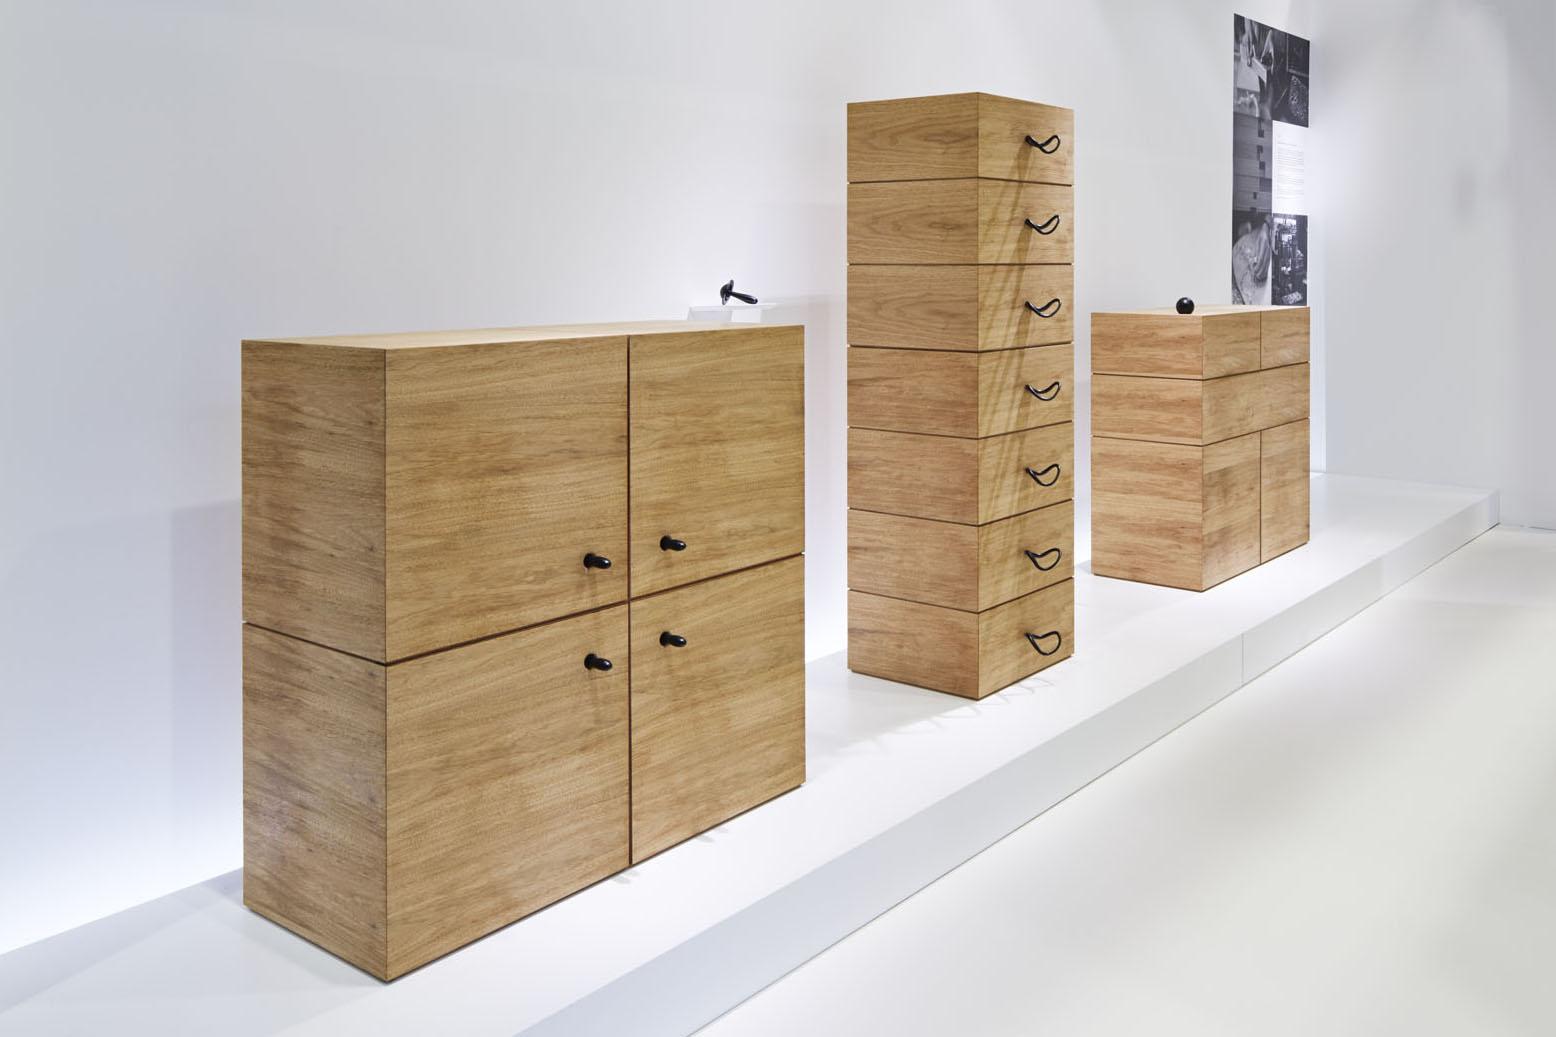 JC07 Fujisato Woodcraft× Ron Gilad